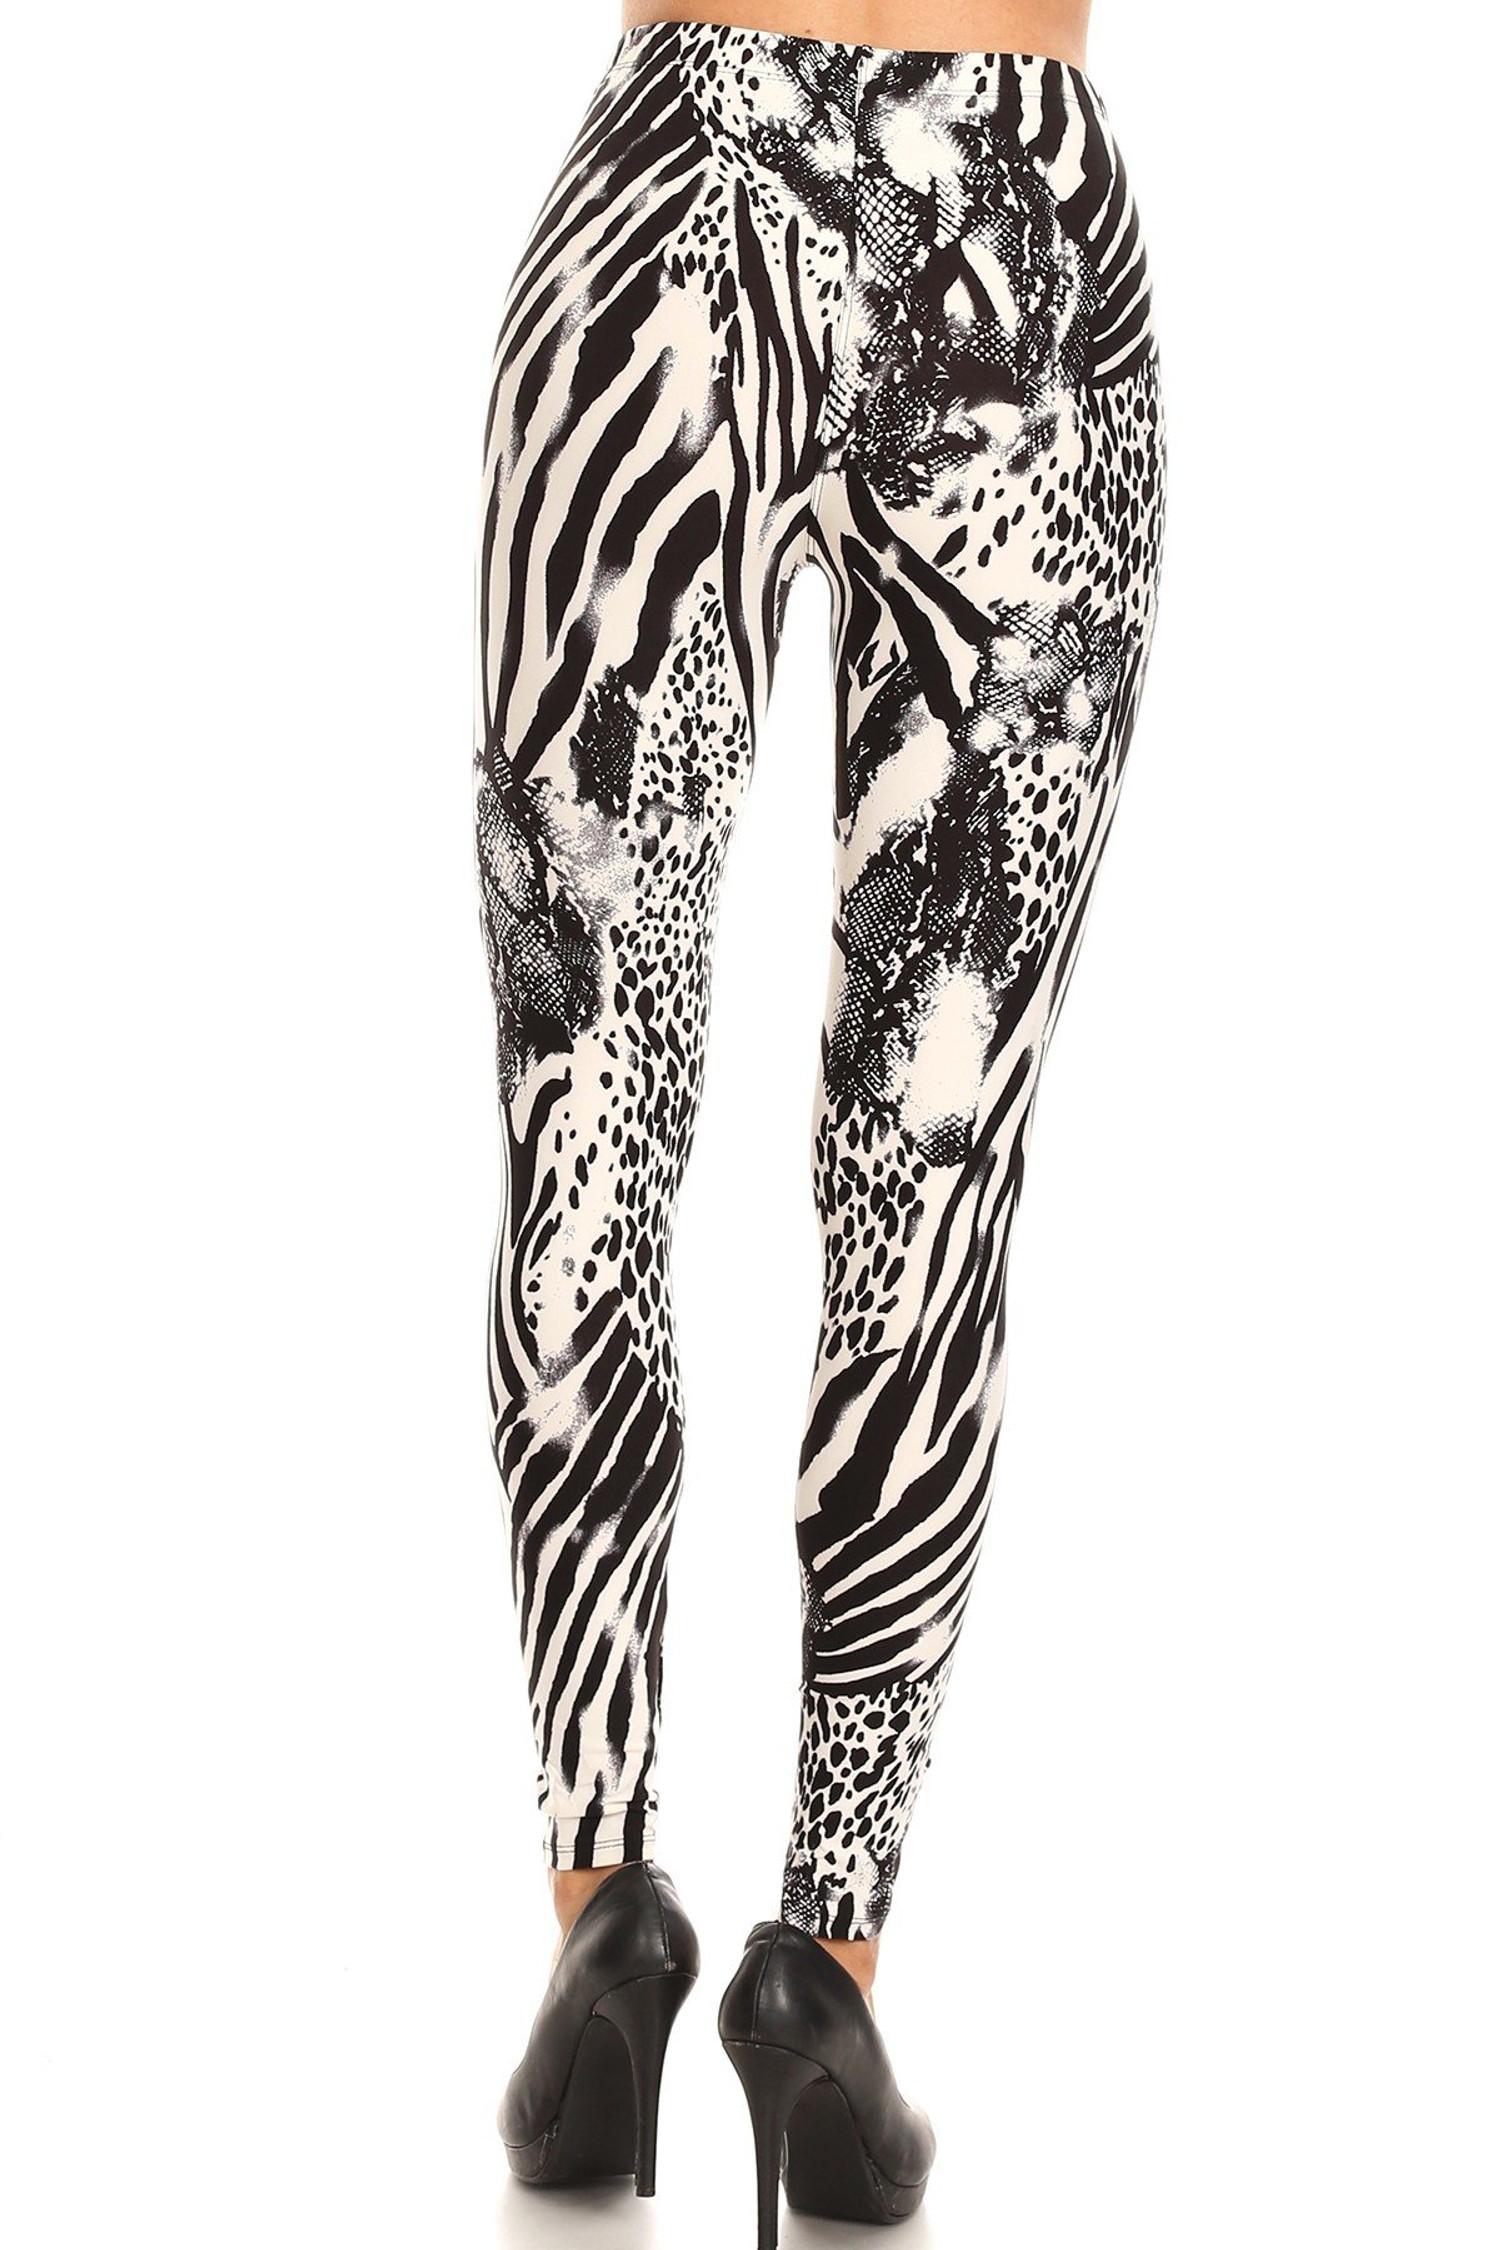 Brushed  Wild Safari Extra Plus Size Leggings - 3X-5X